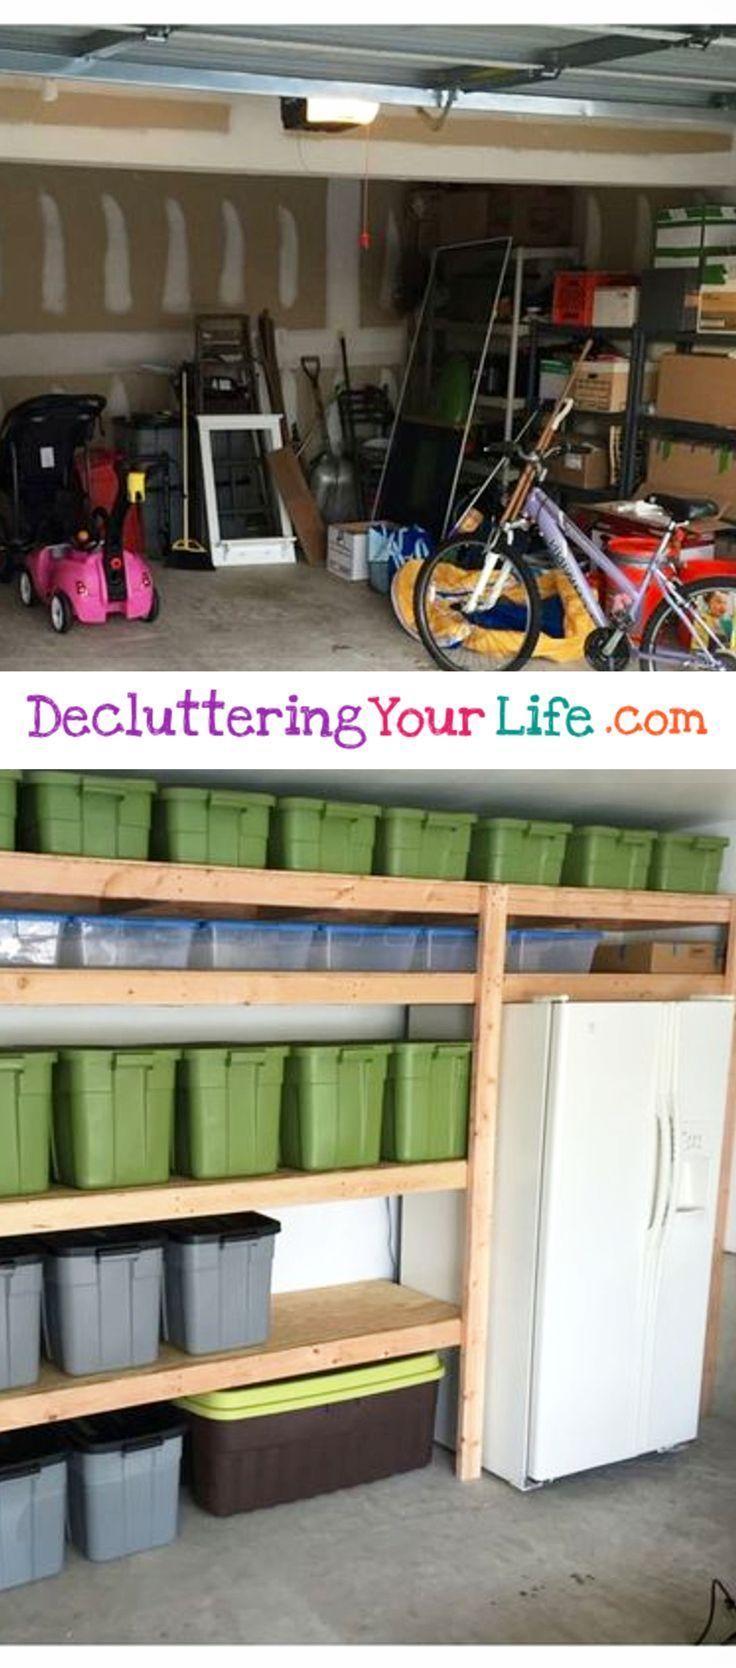 Organizing clutter in the garage - DIY garage organization ideas #organizingclutter